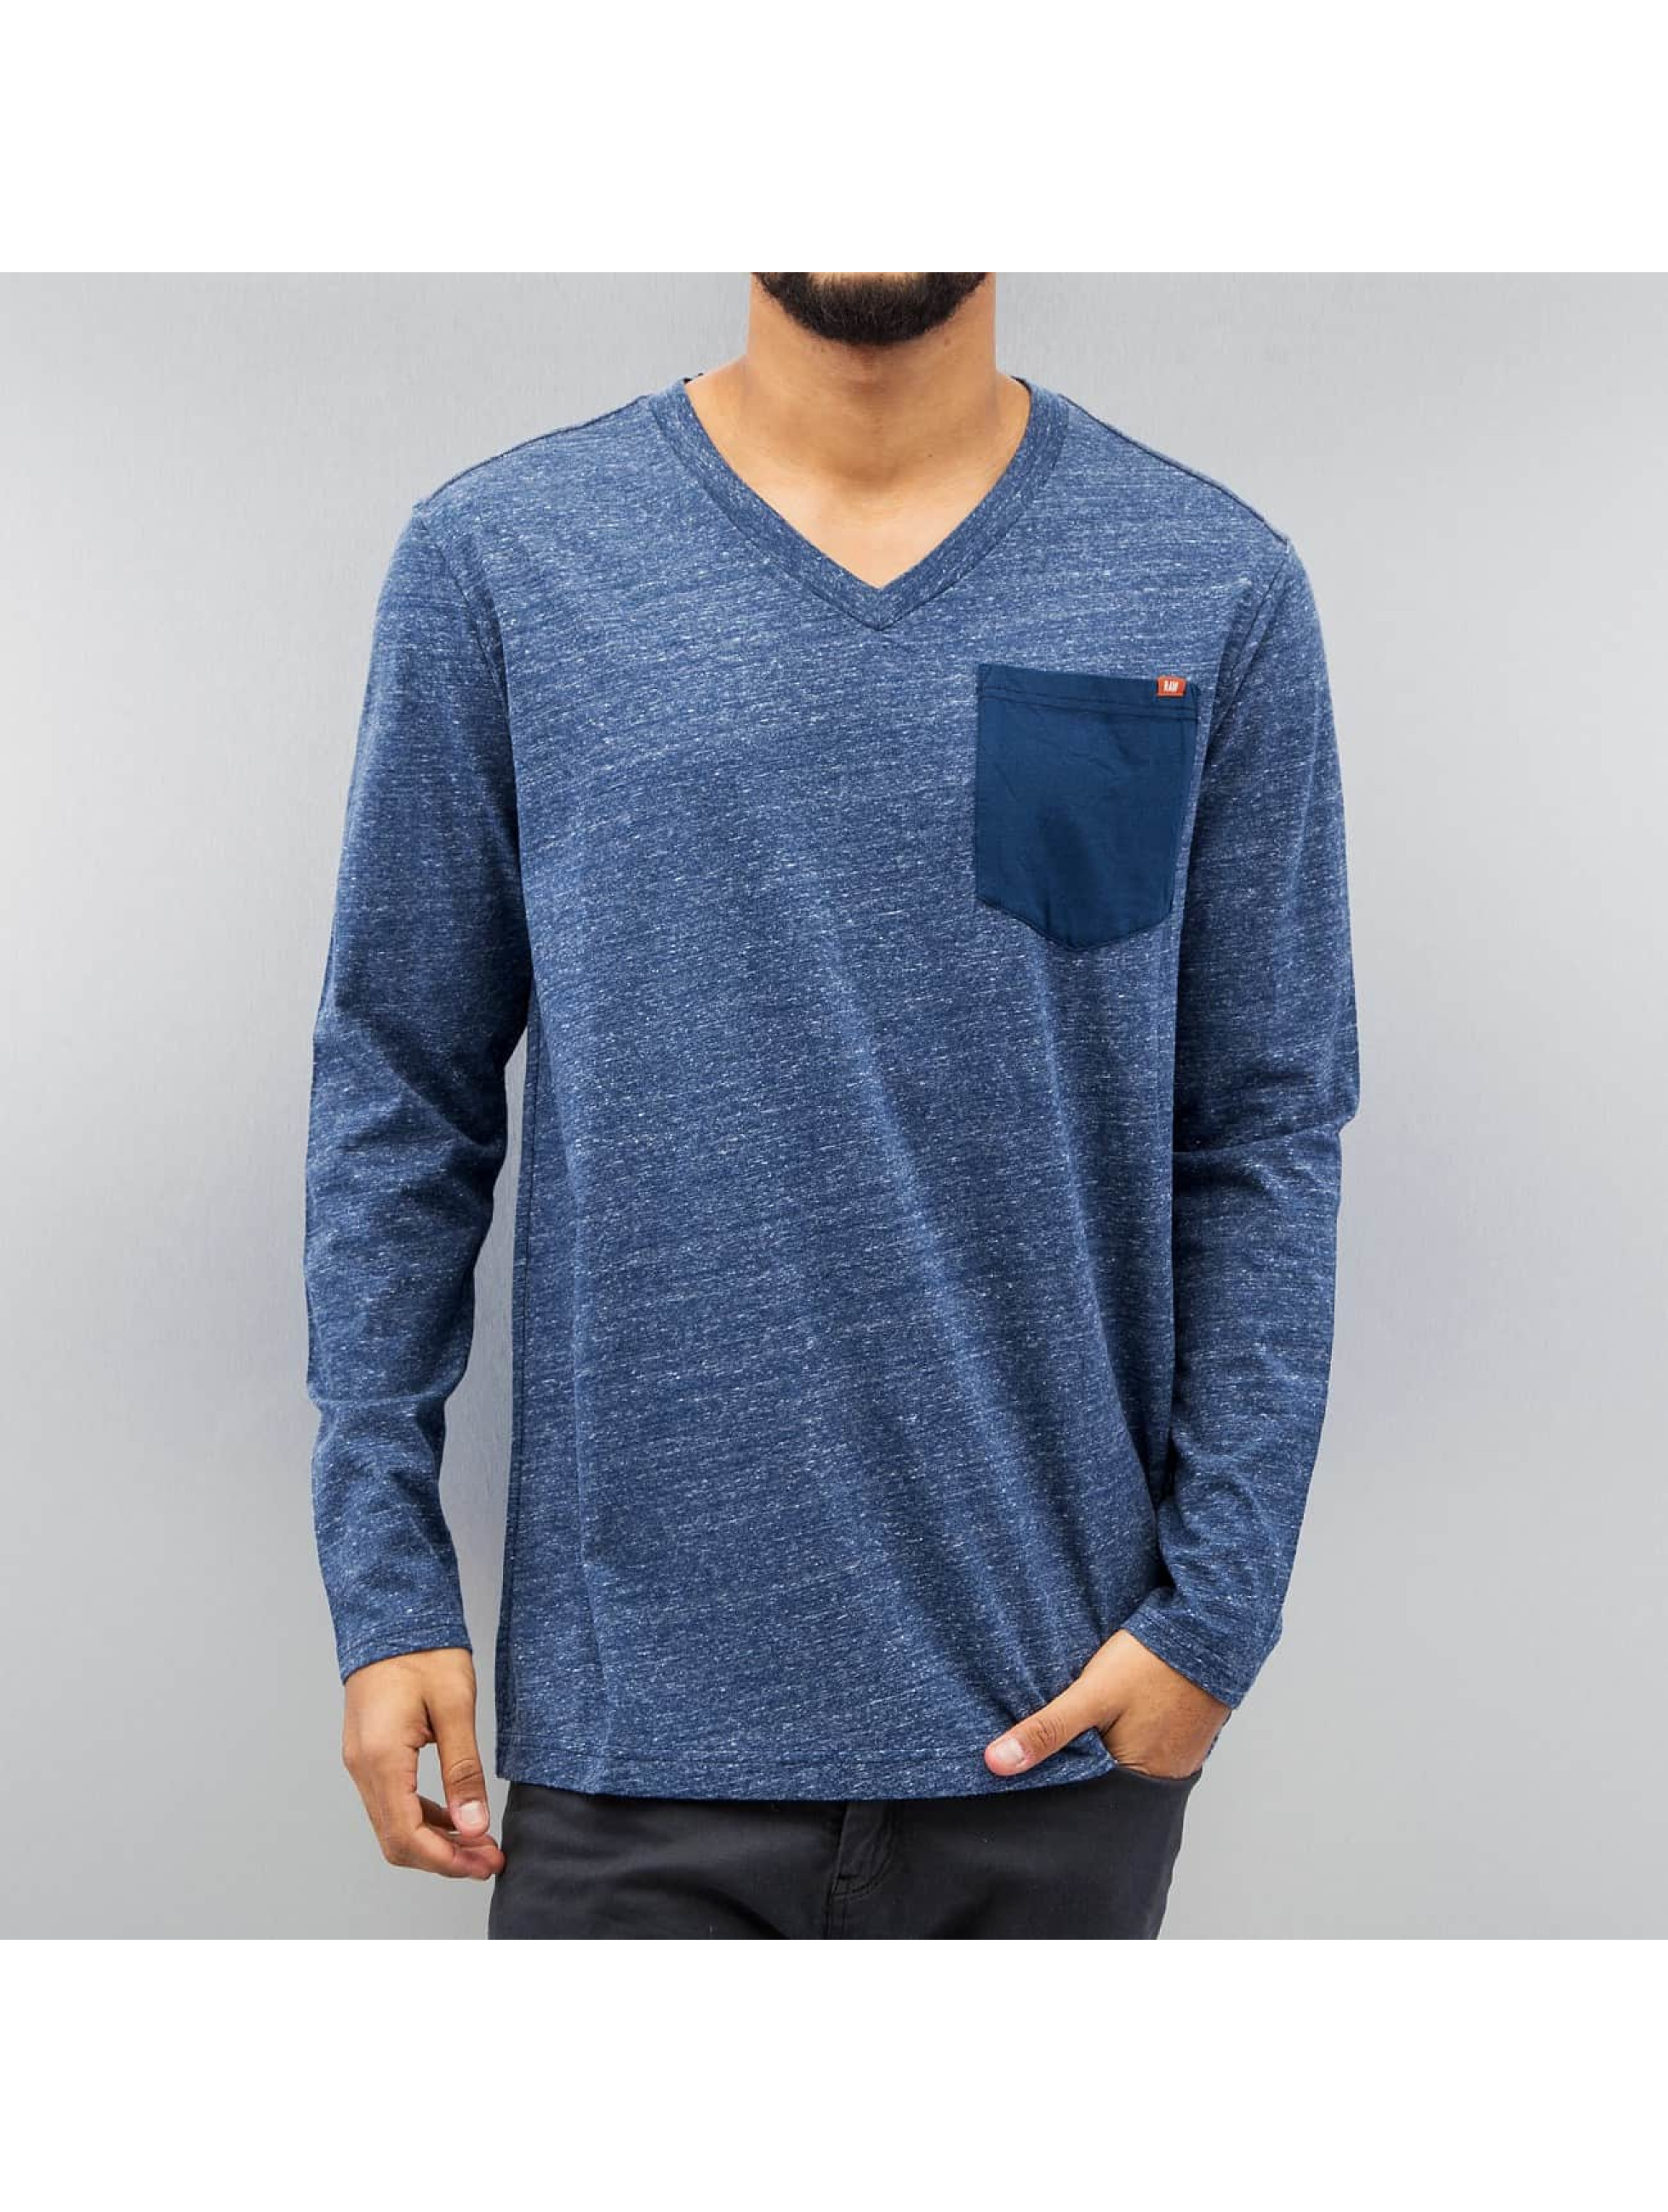 G-Star Водолазка Riban Pocket Premium Compact Jersey синий